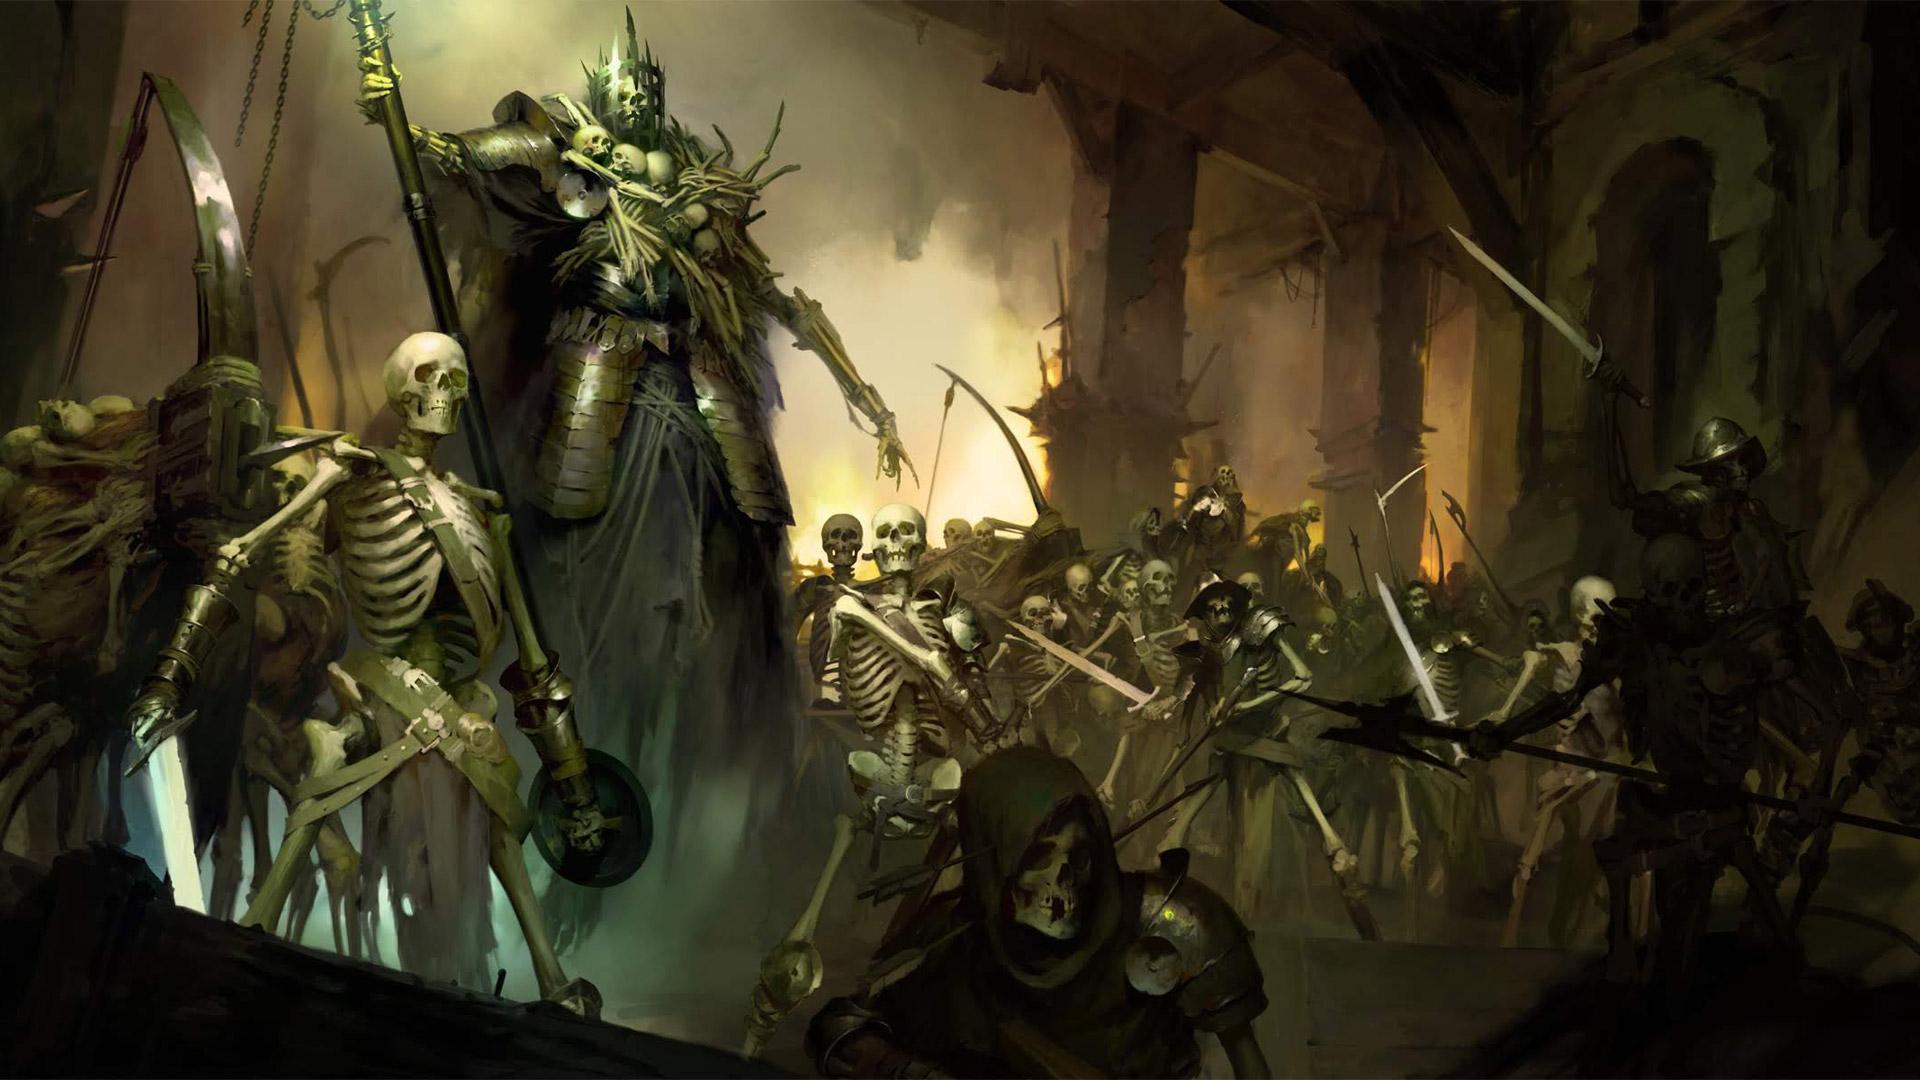 Diablo IV Wallpaper in 1920x1080